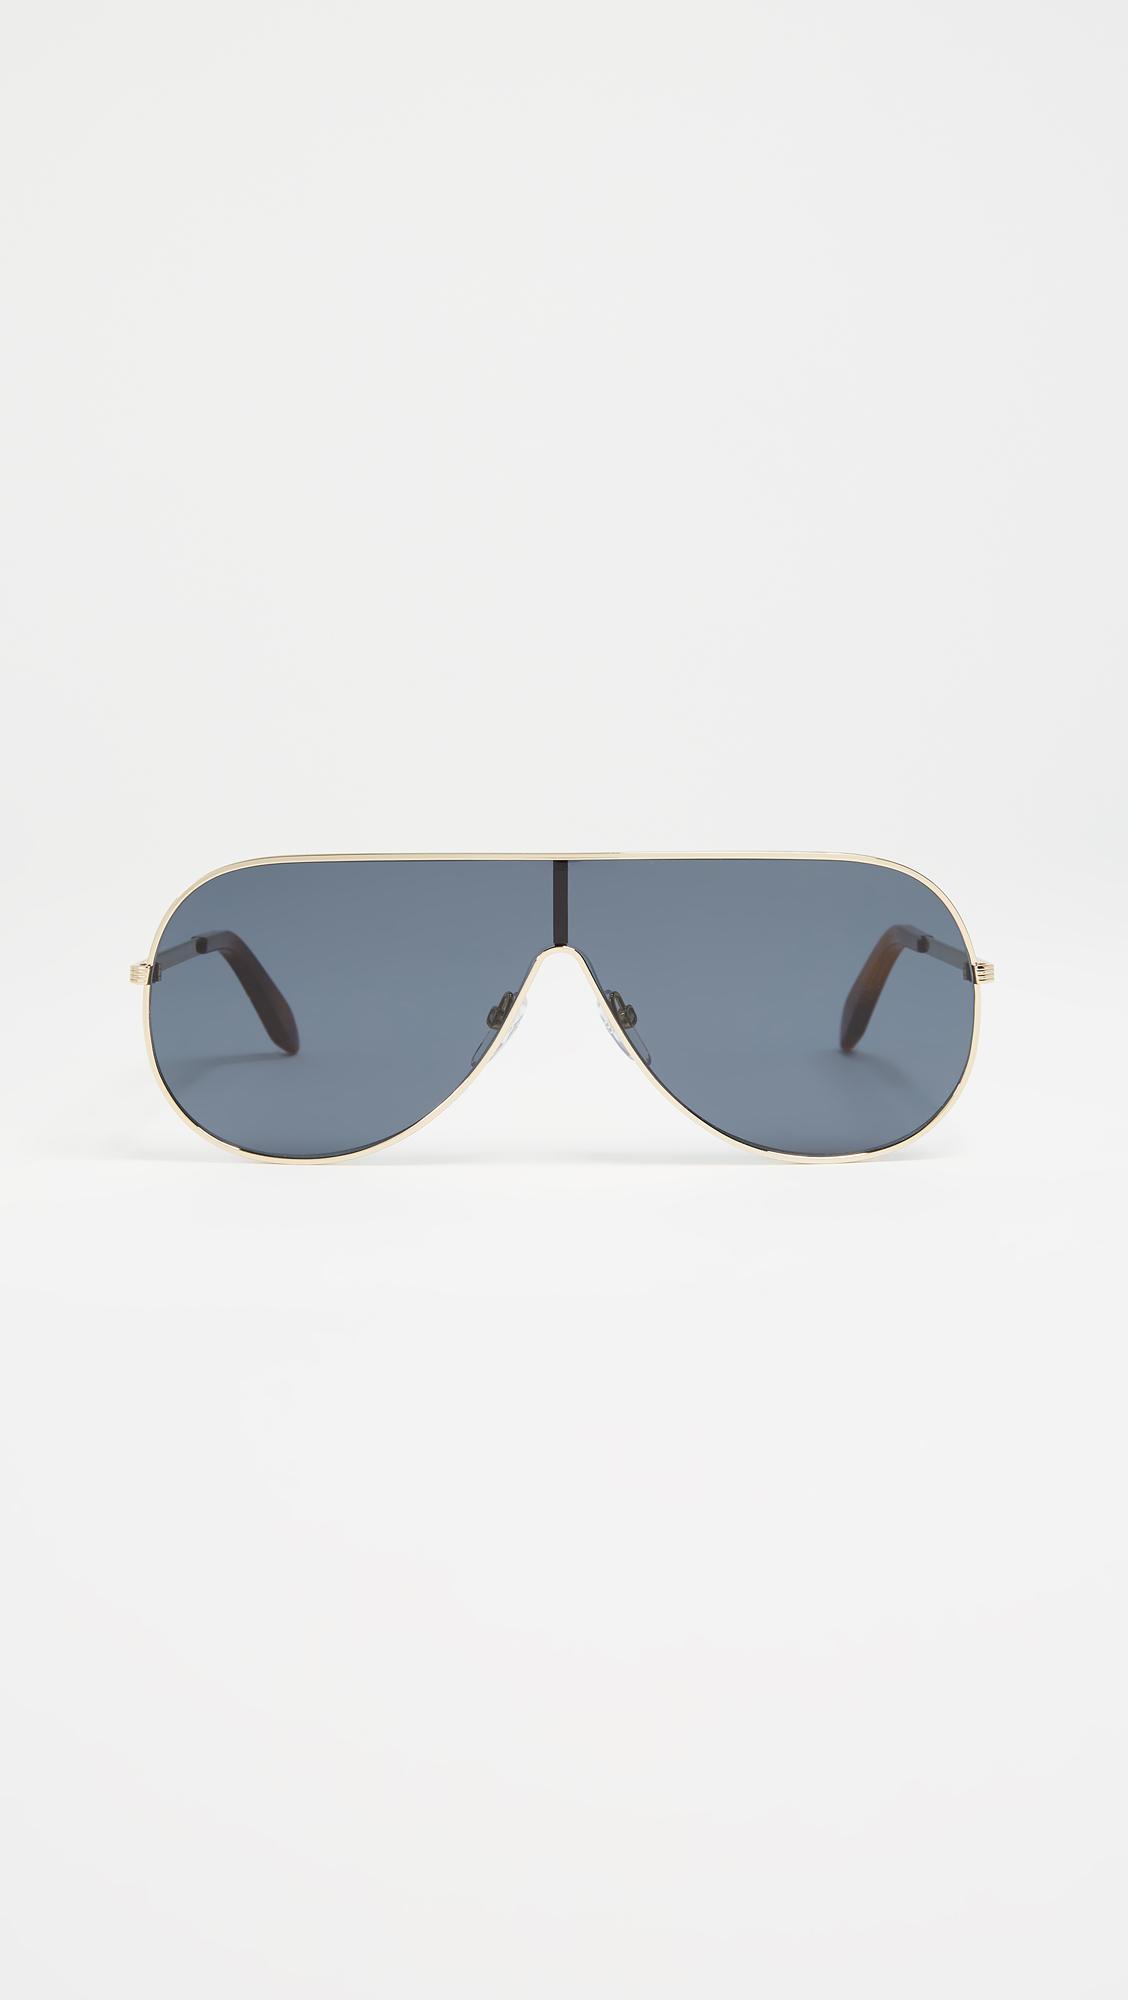 4b544d710d Victoria Beckham Grooved Metal Visor Sunglasses - Lyst